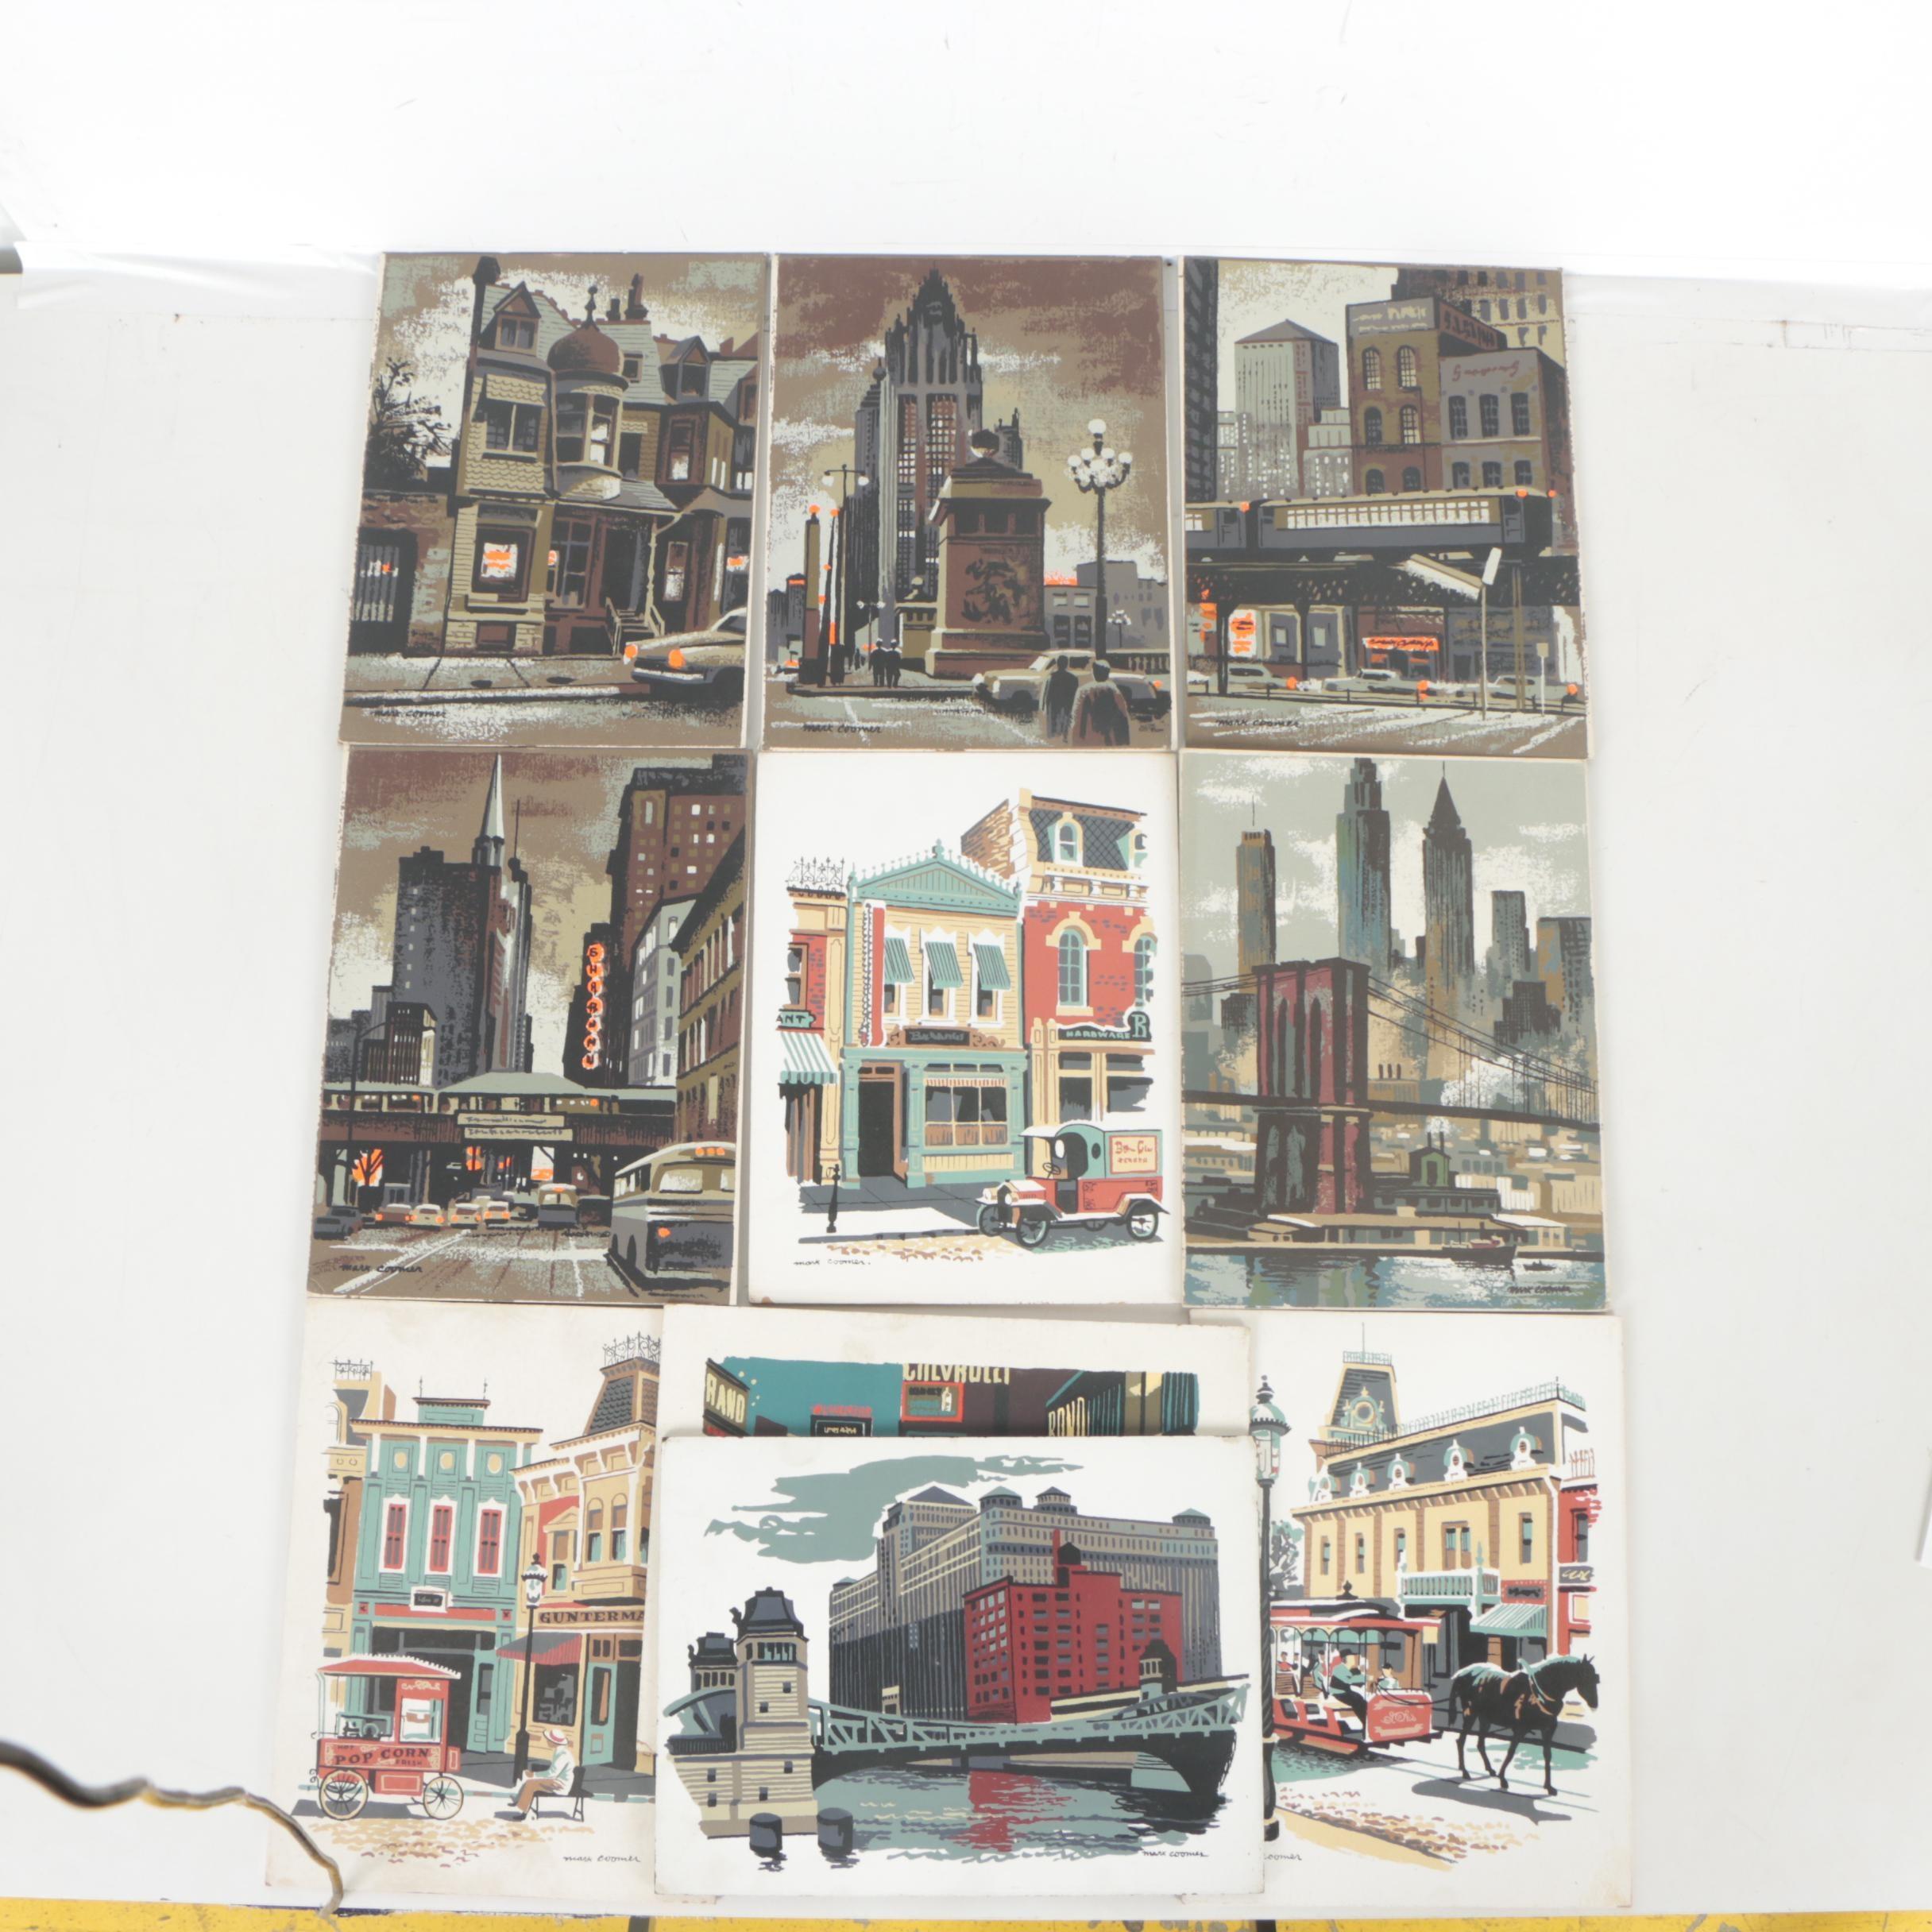 Mark Coomer Serigraph of Architectural Landscapes